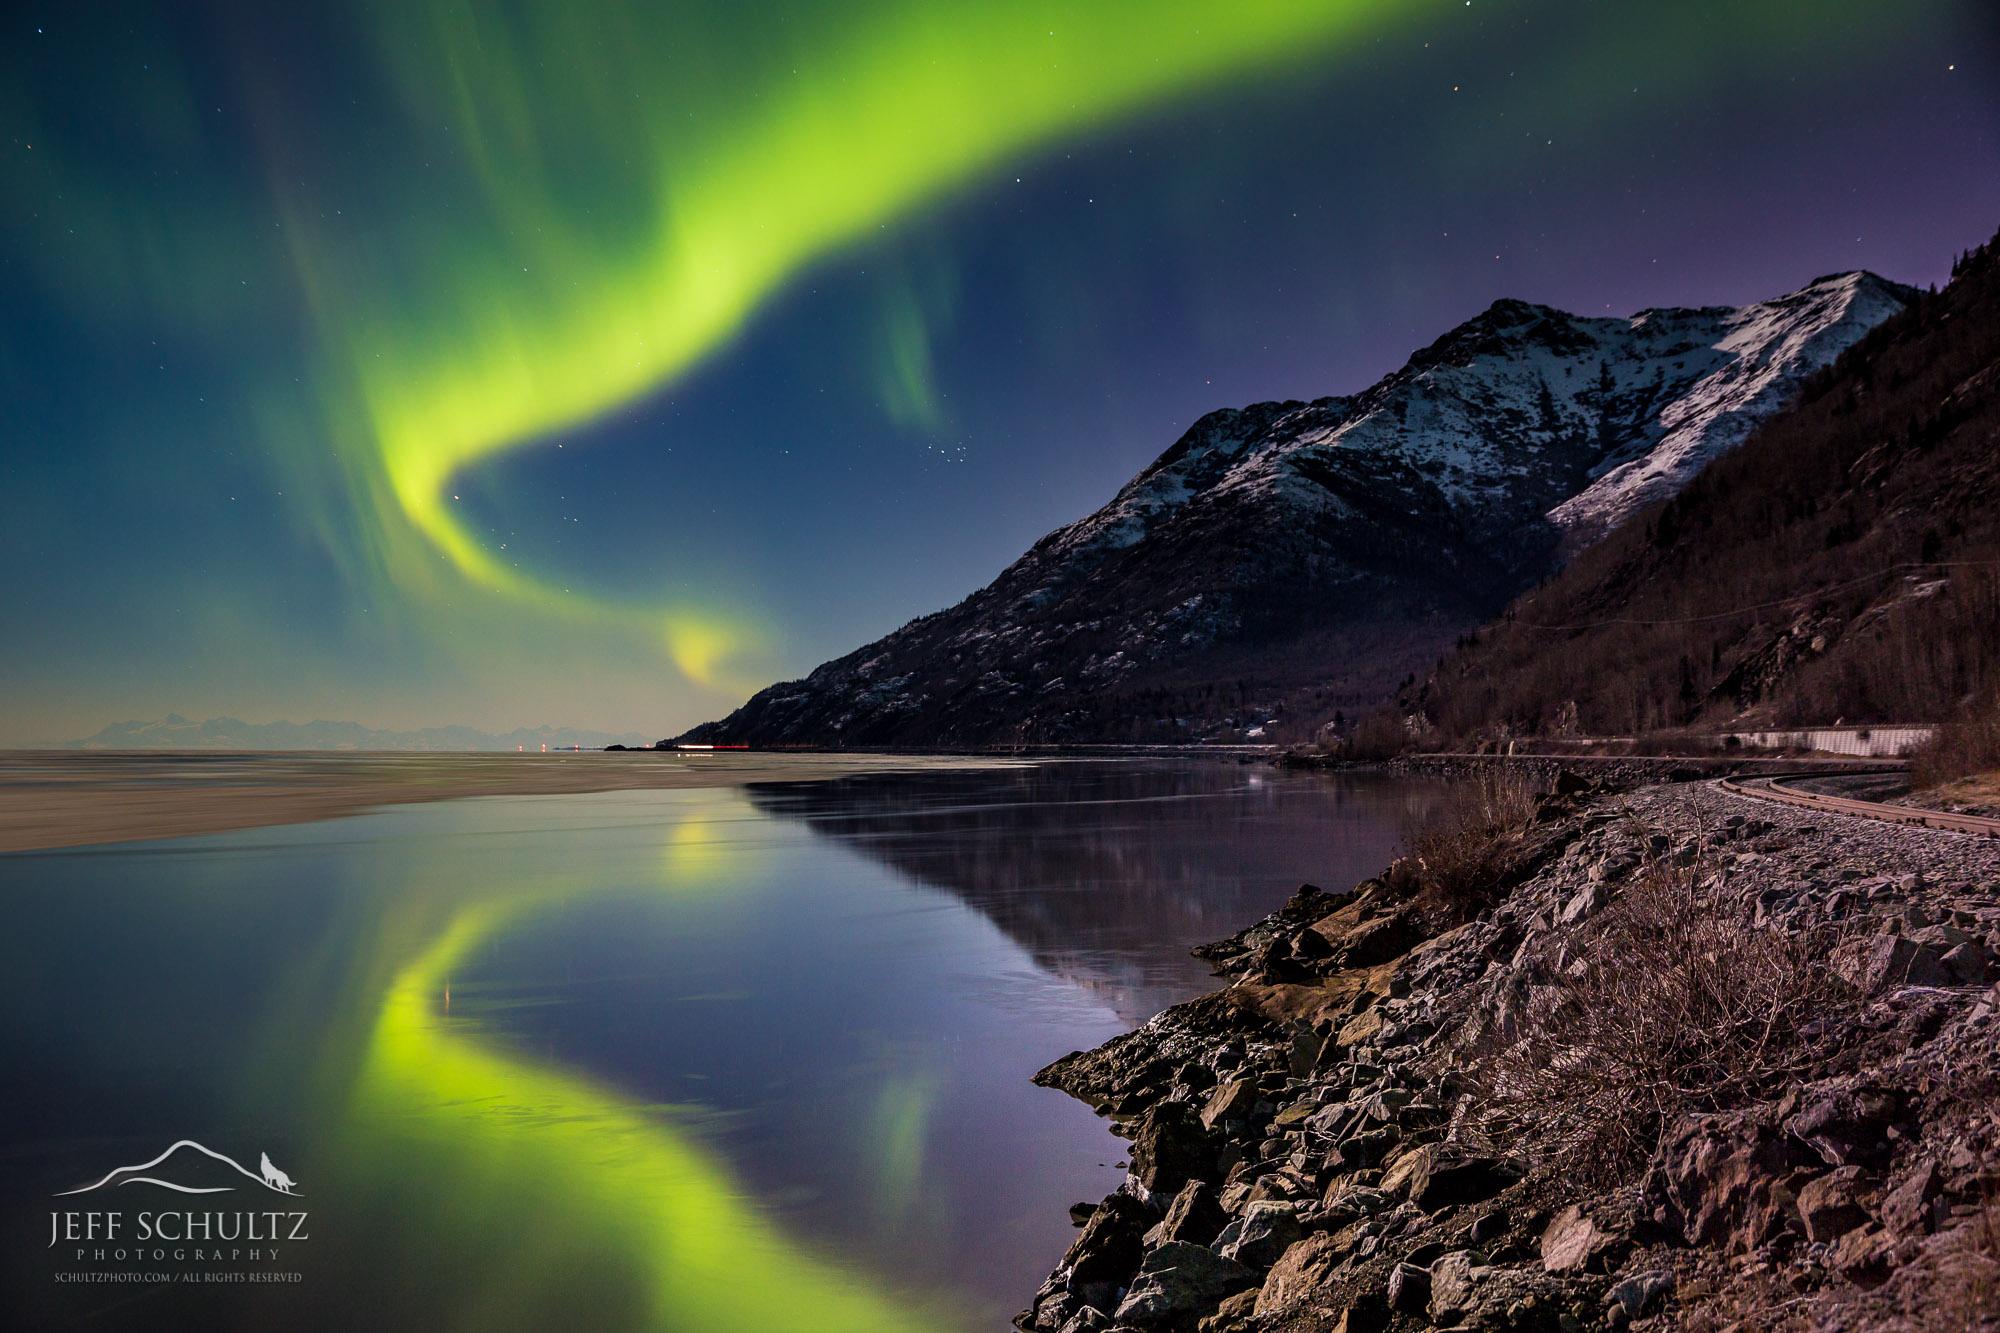 Sea-to-Summit Turnagain, Alaska Photo Tour & Workshop